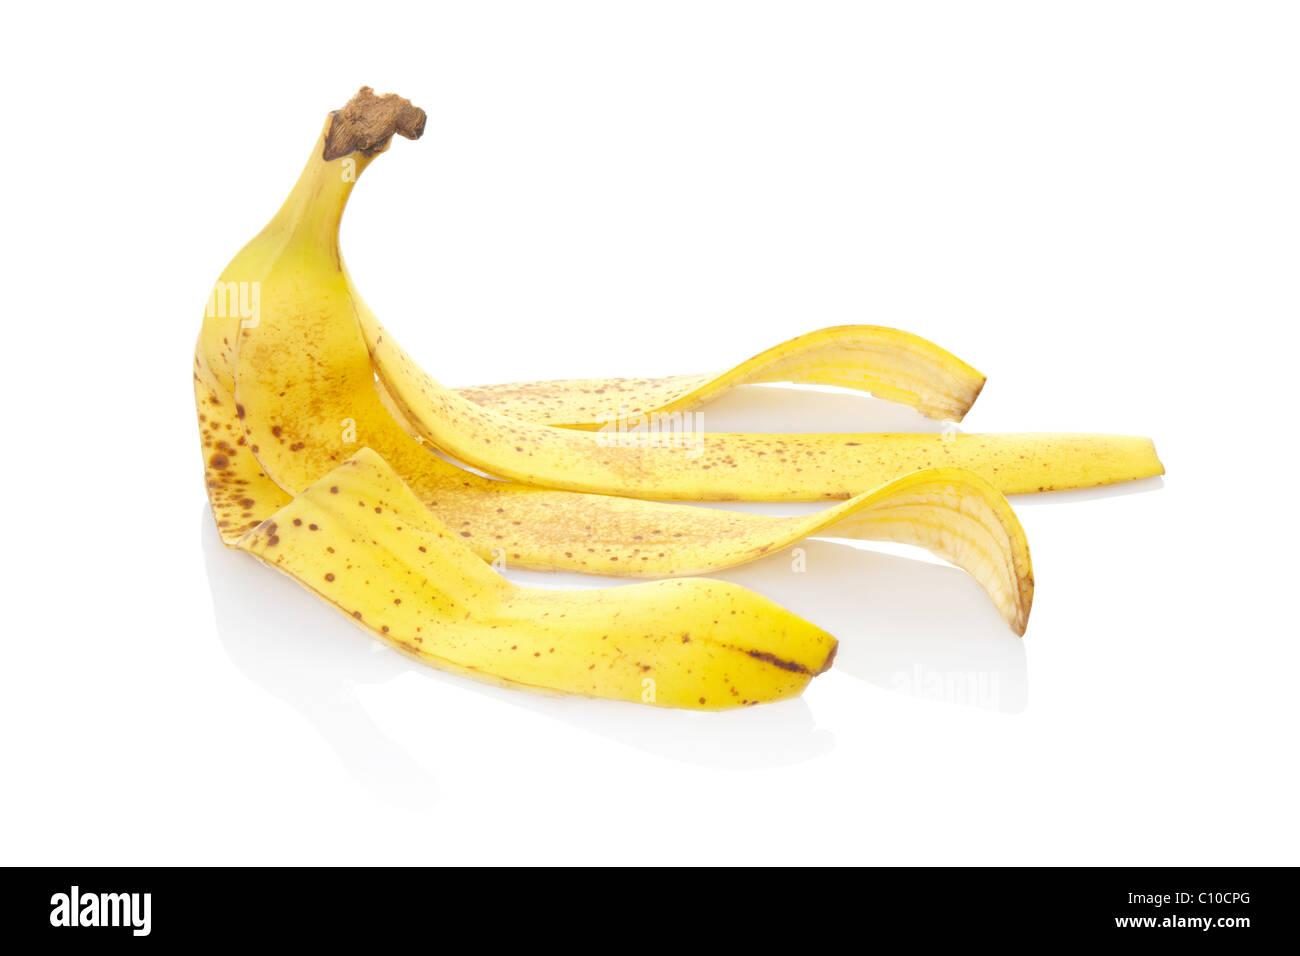 Banana peel isolated on white - Stock Image